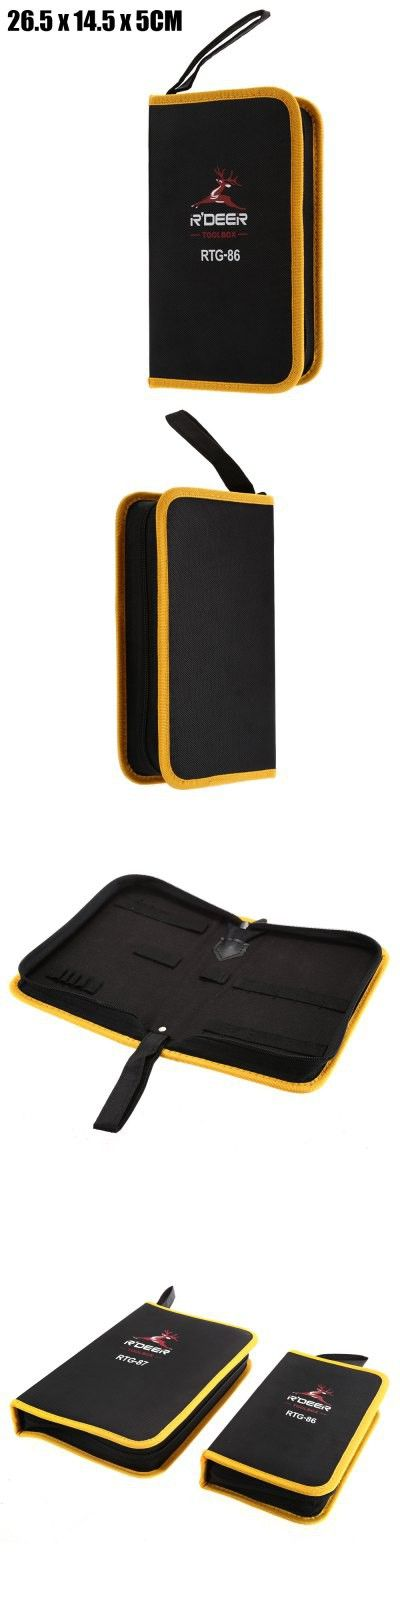 Robust Deer RTG - 86 Portable Electrician Tool Bag